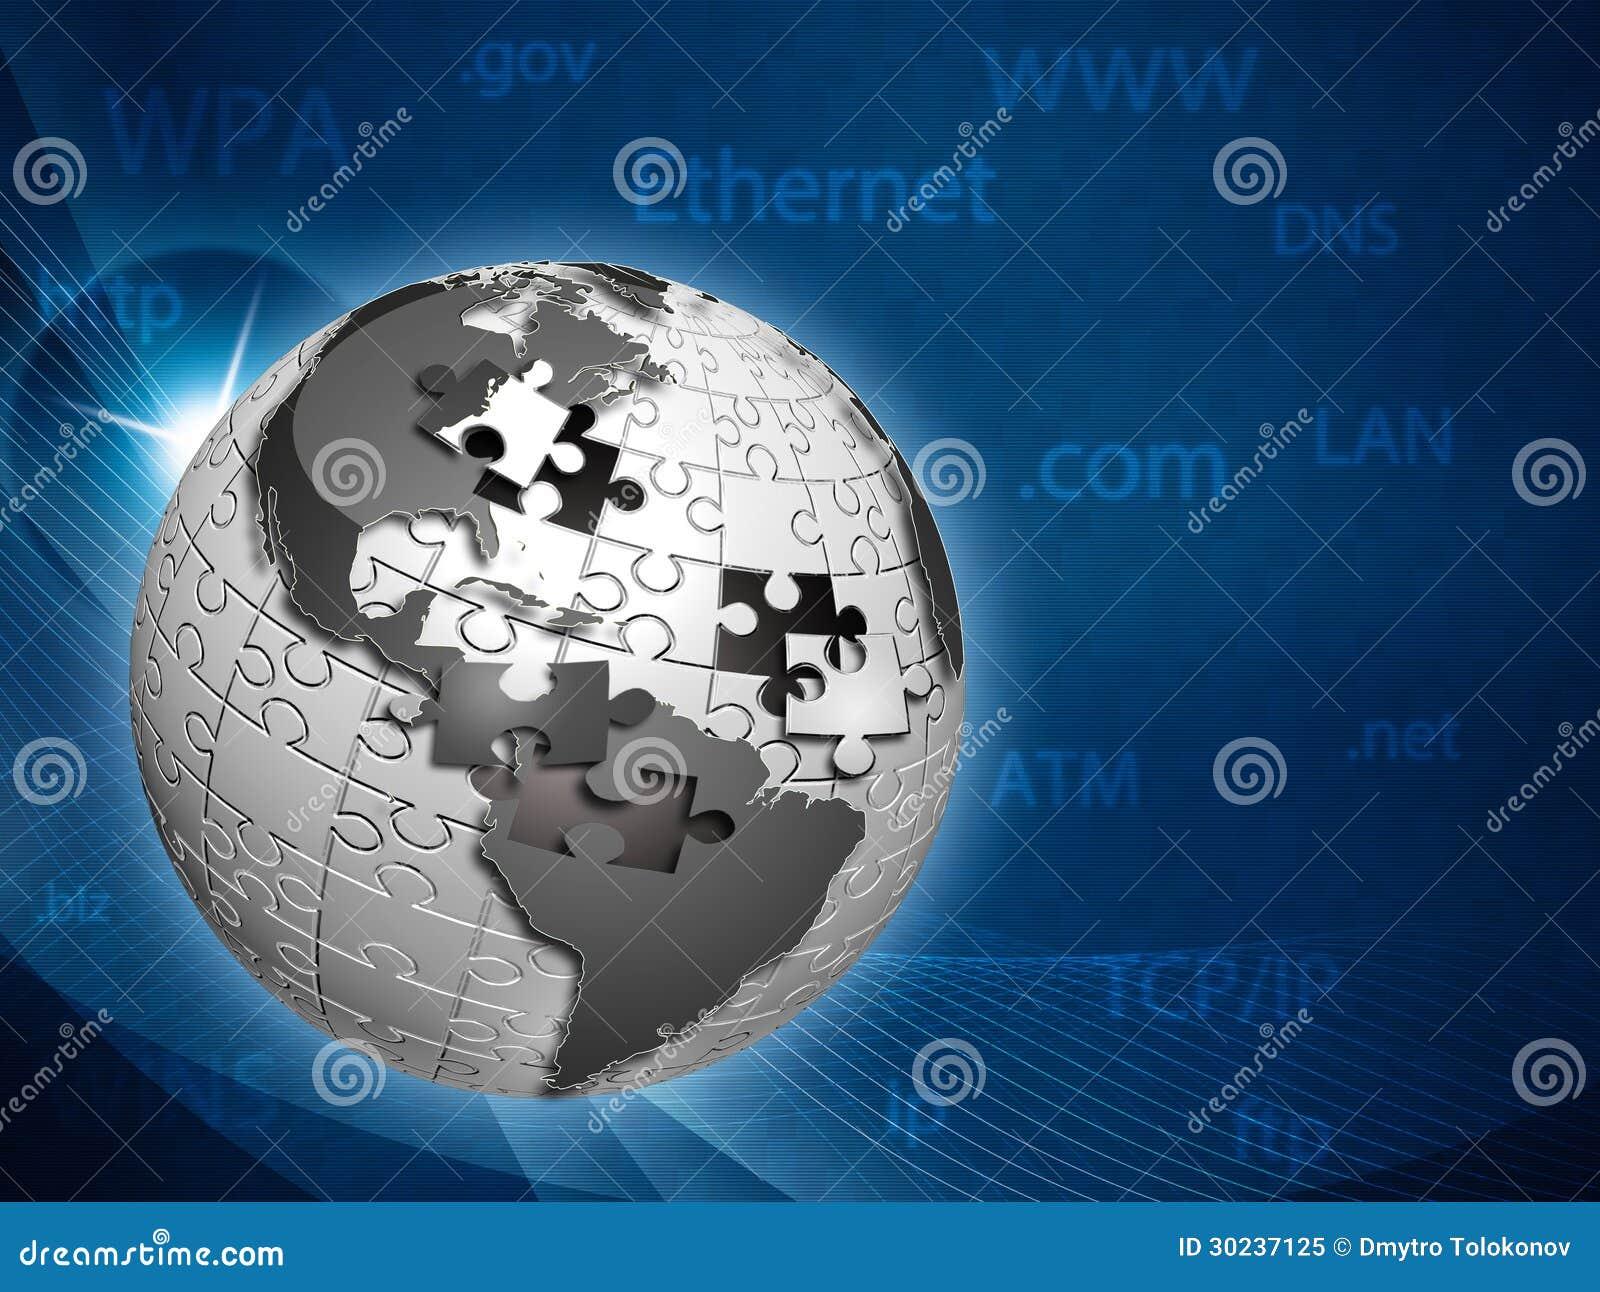 techno globalism essay